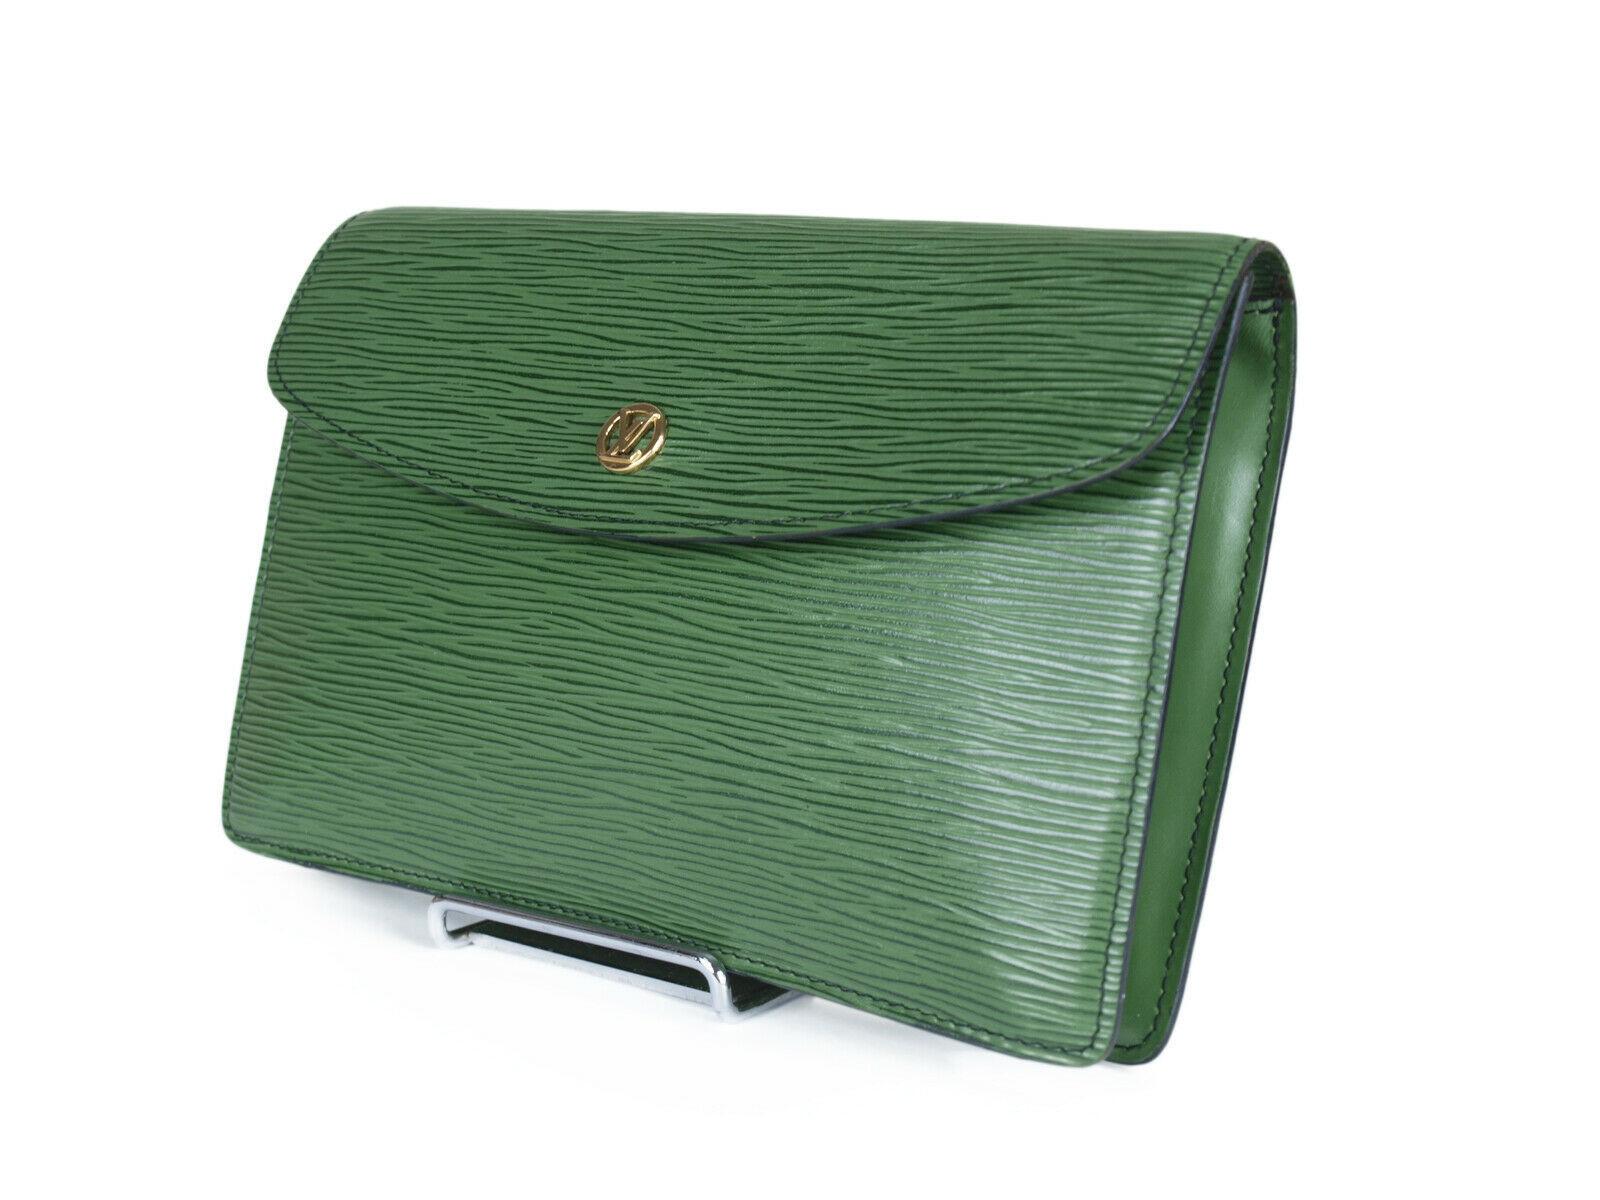 LOUIS VUITTON Montaigne Epi Green Pochette Clutch Bag LP3014 - $269.00